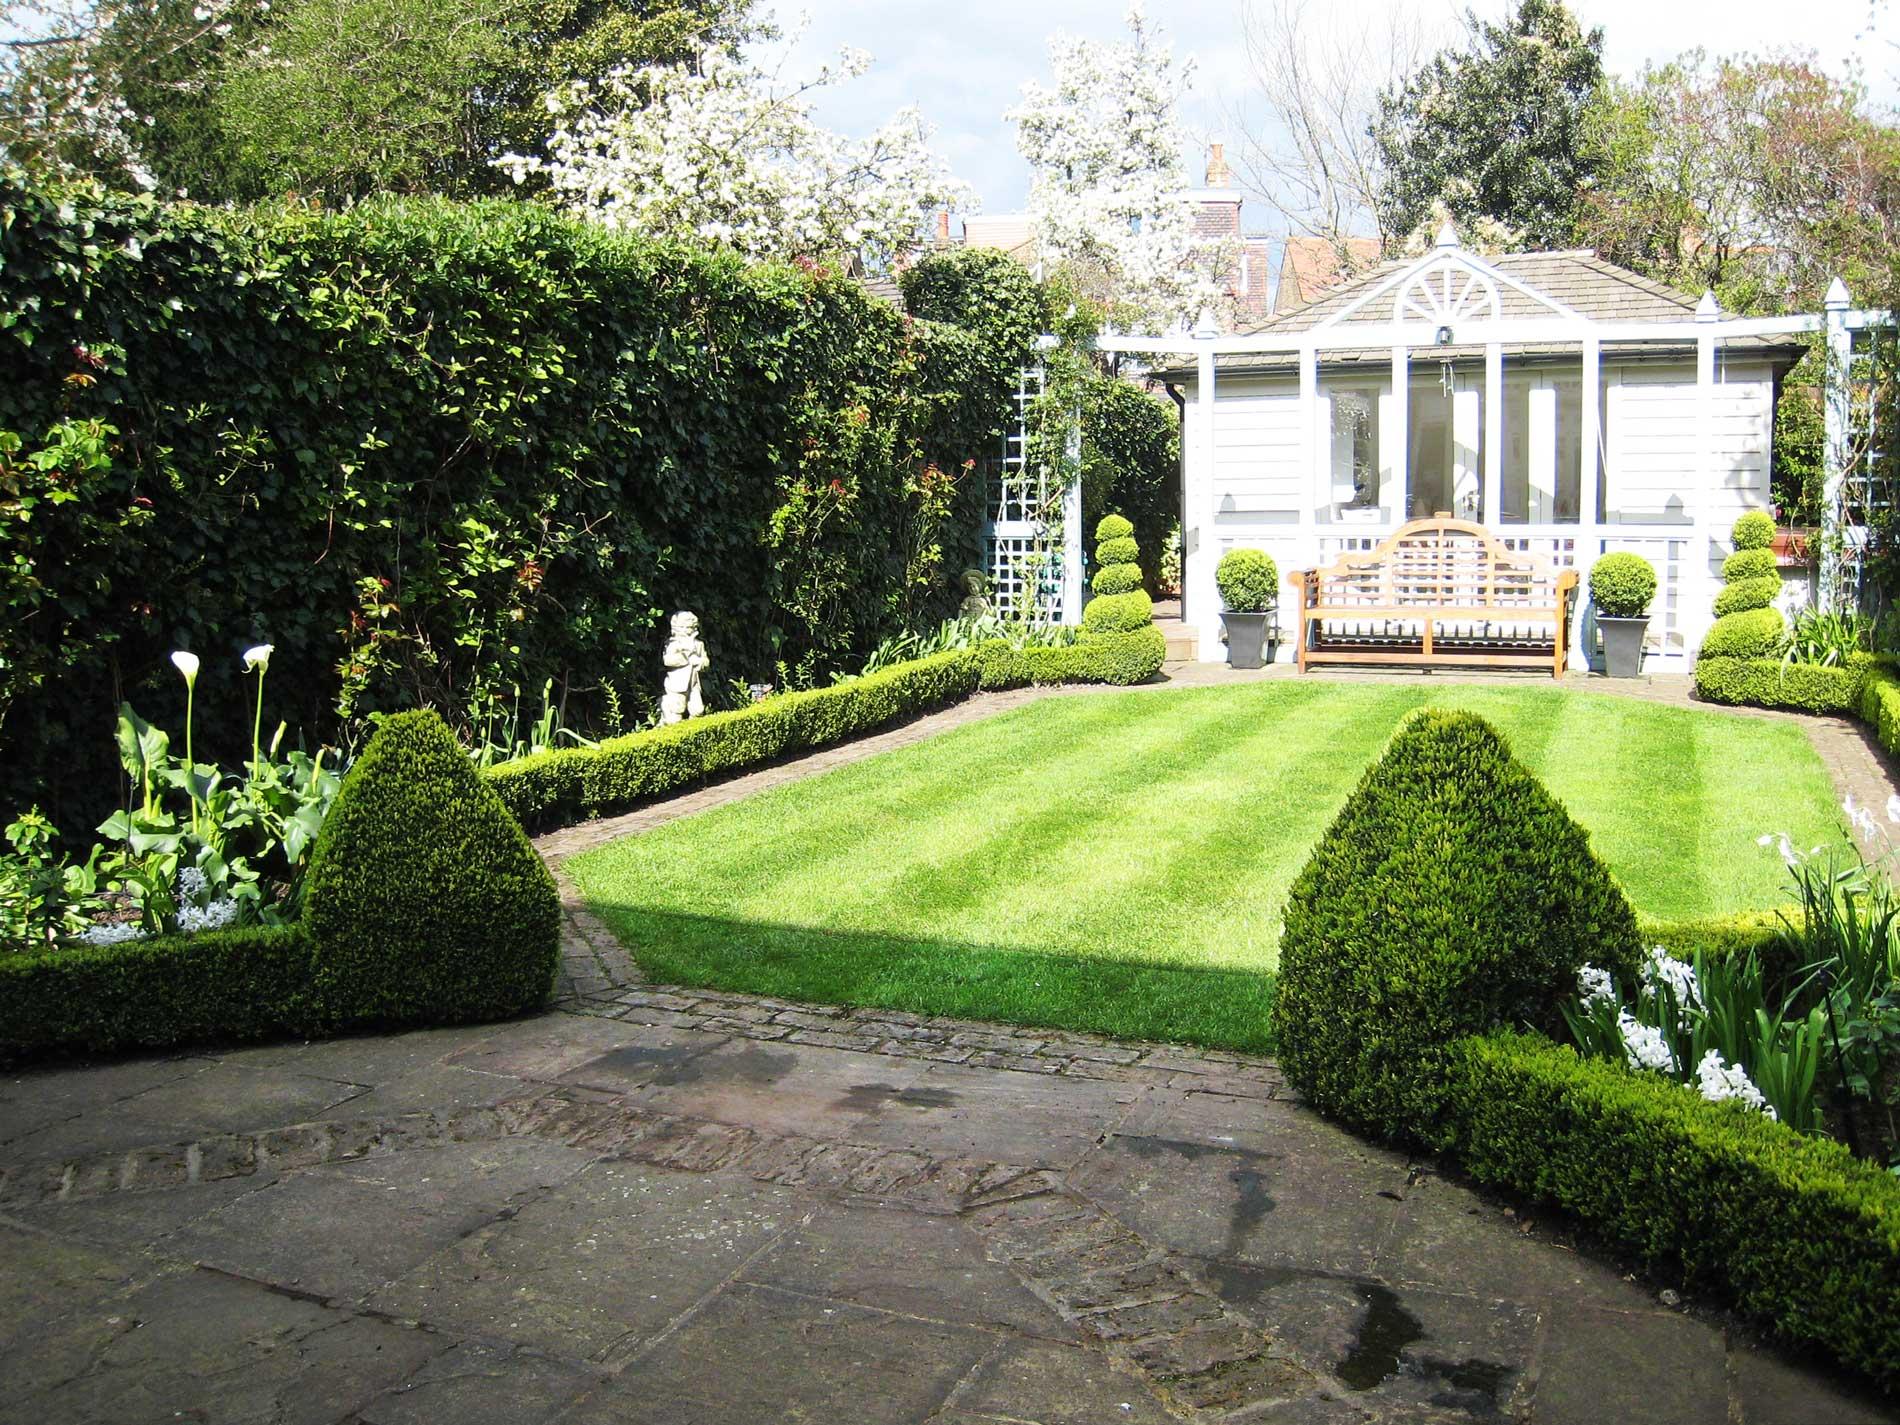 West London Gardening Services